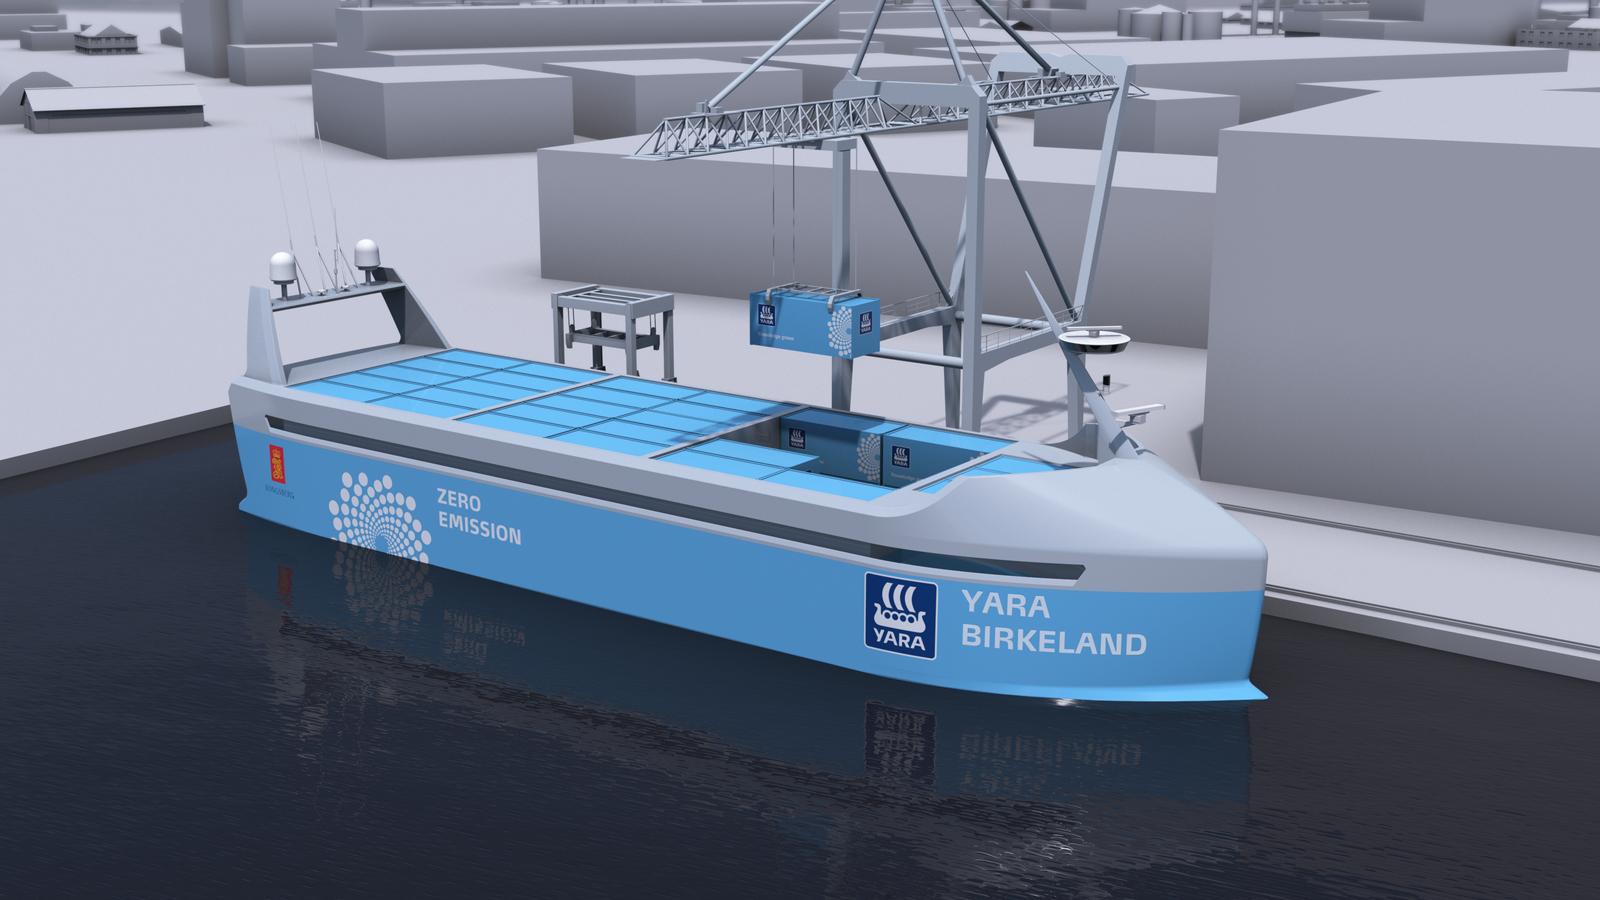 Rendering of Yara's self-driving ship.